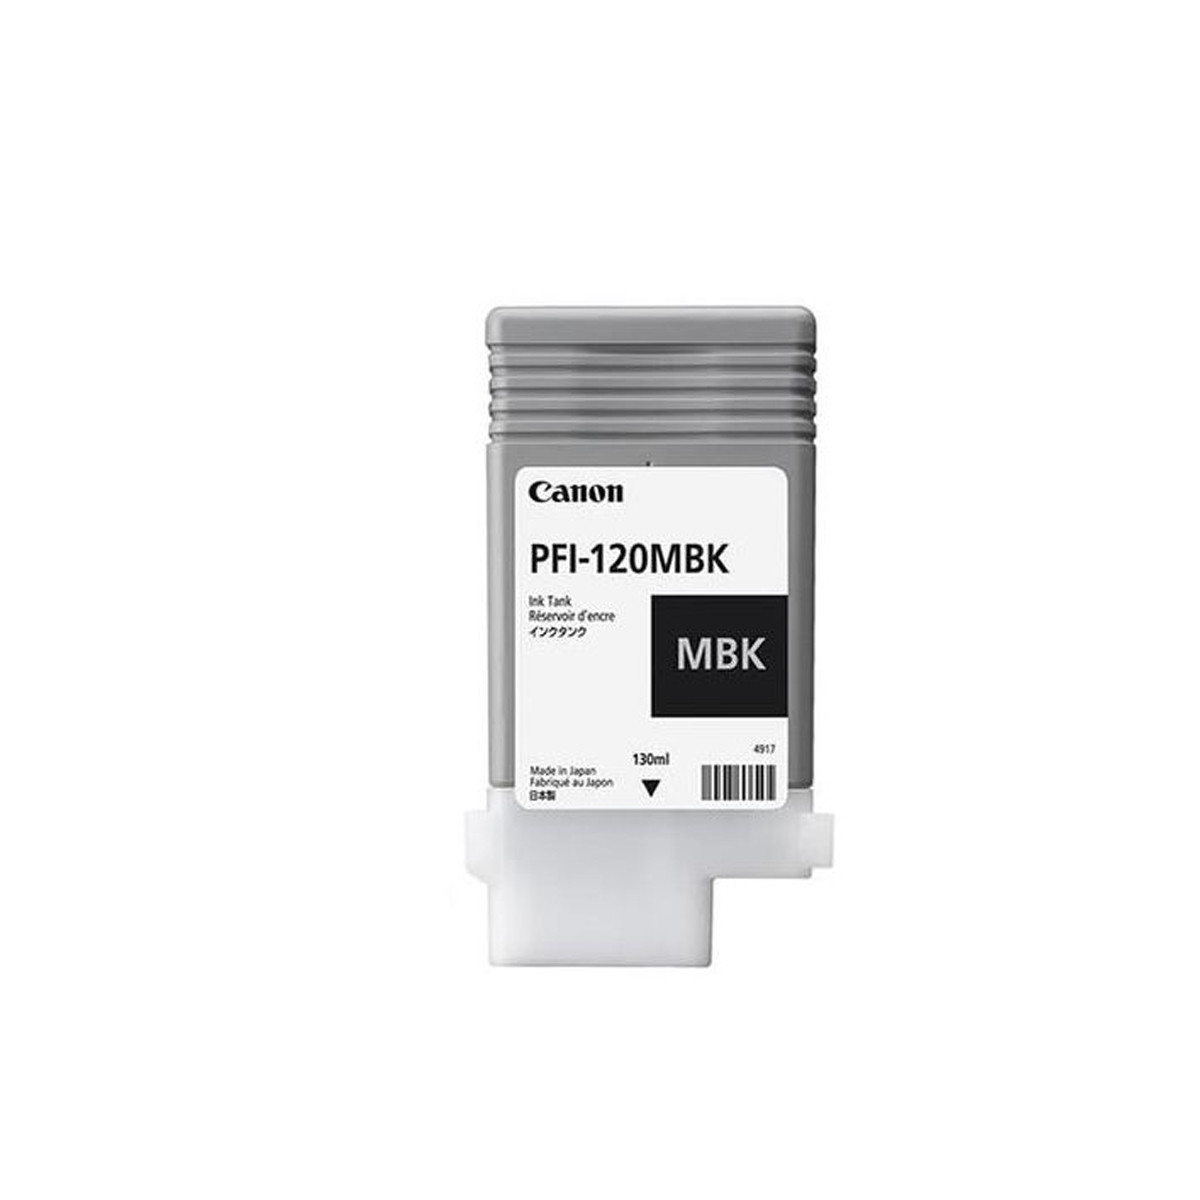 Cartucho de Tinta Canon PFI-120 PFI-120MBK Preto Fosco   TM200   Original 130ml